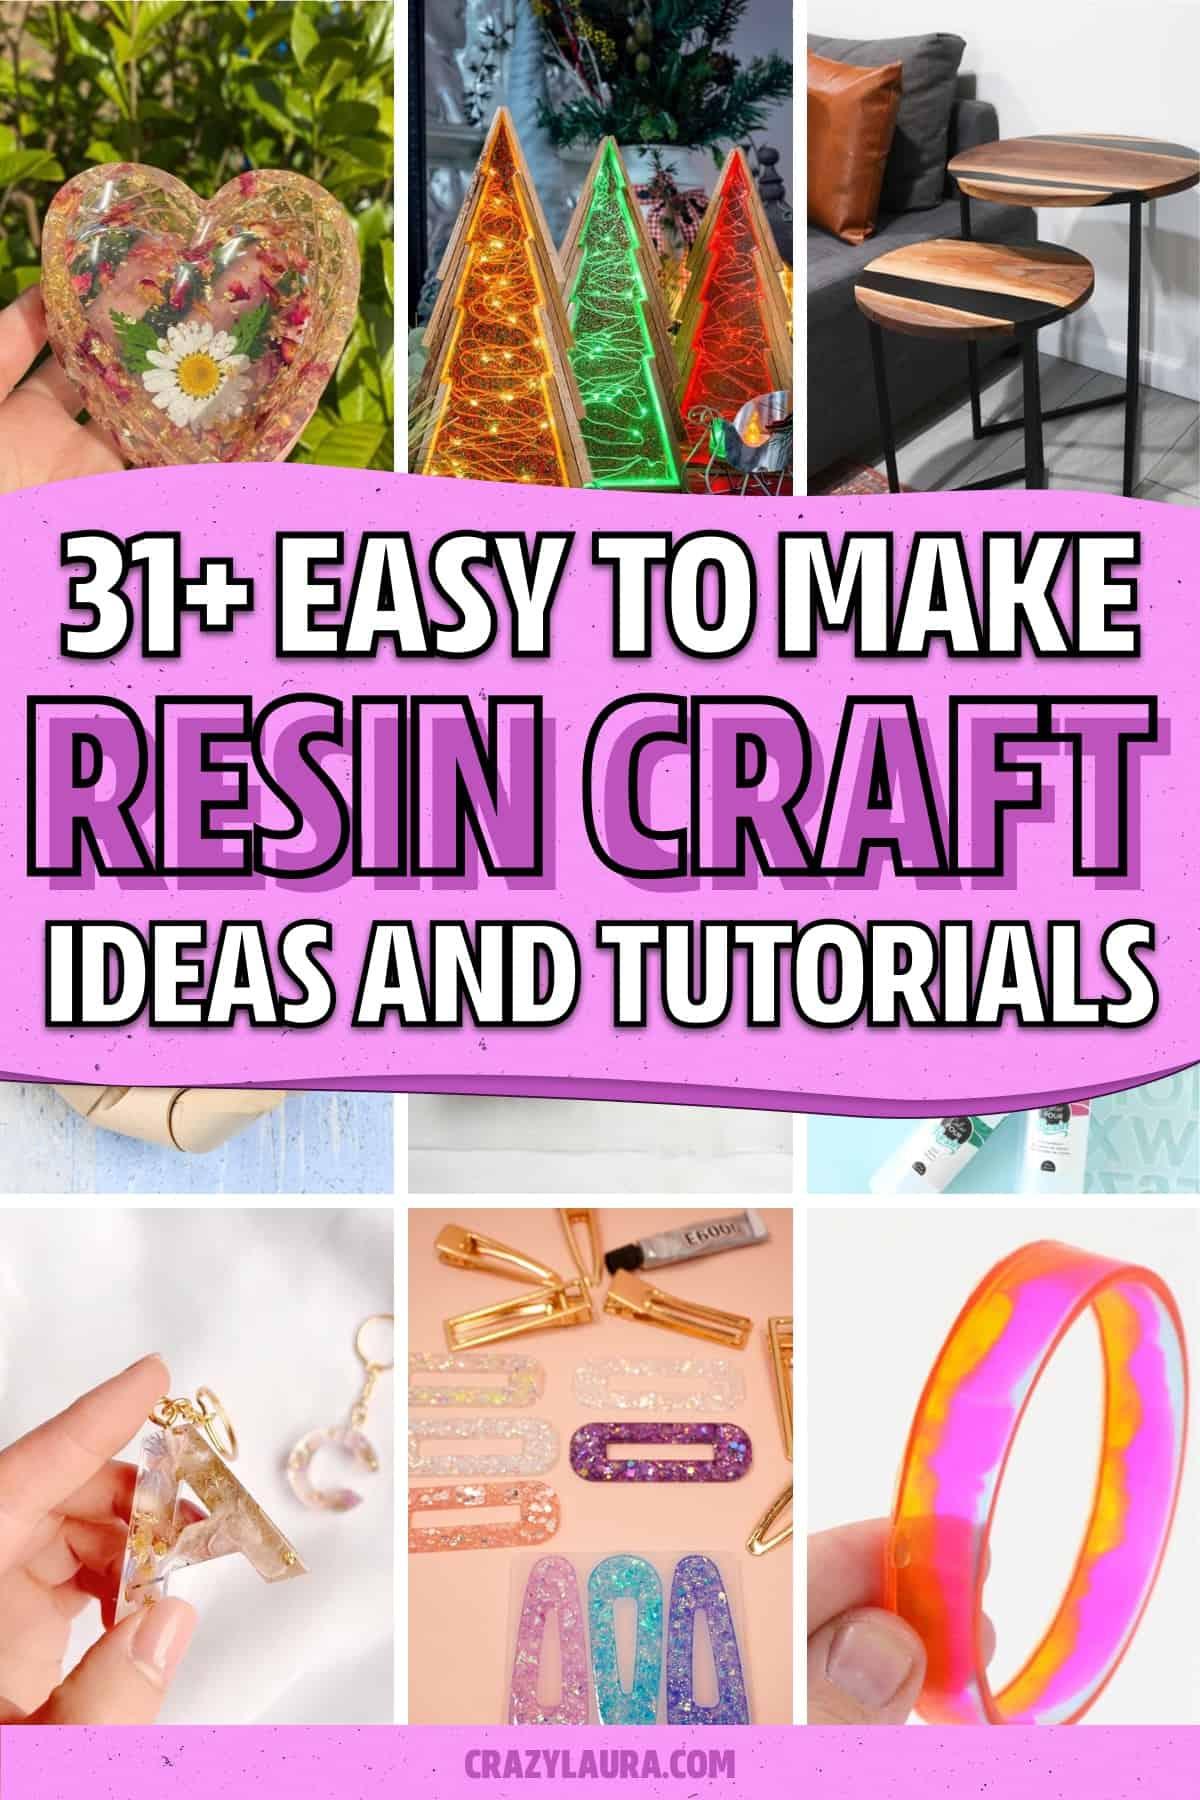 resin craft ideas and tutorials